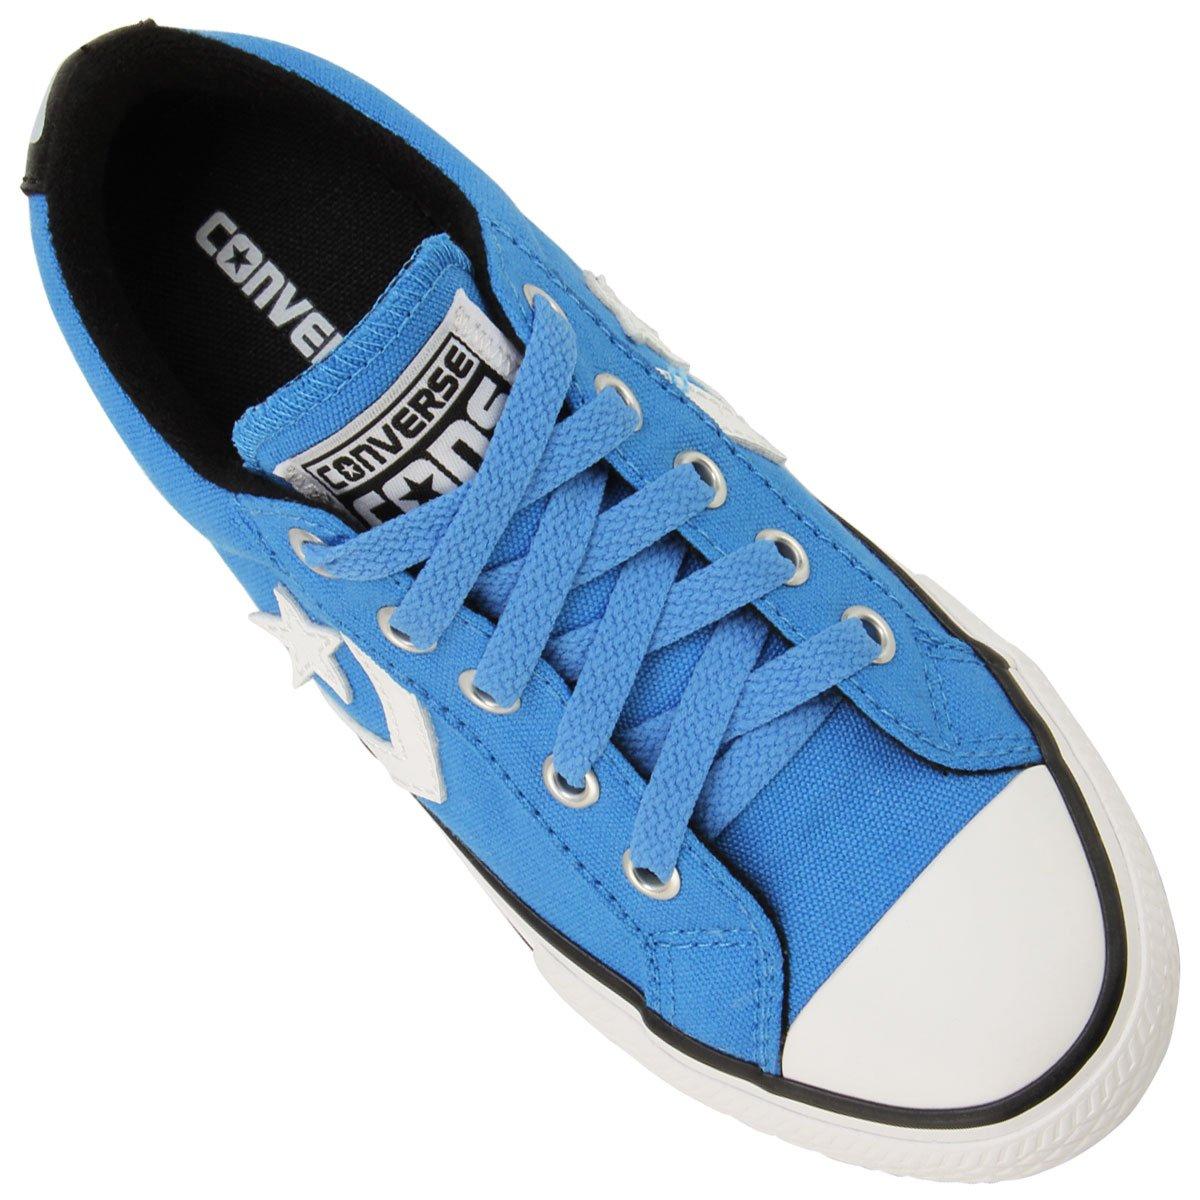 4a42ea1f69e ... Tênis Converse ALL STAR Player EV Infantil - Azul Claro+Branco.  COLLECTION  LANÇAMENTO